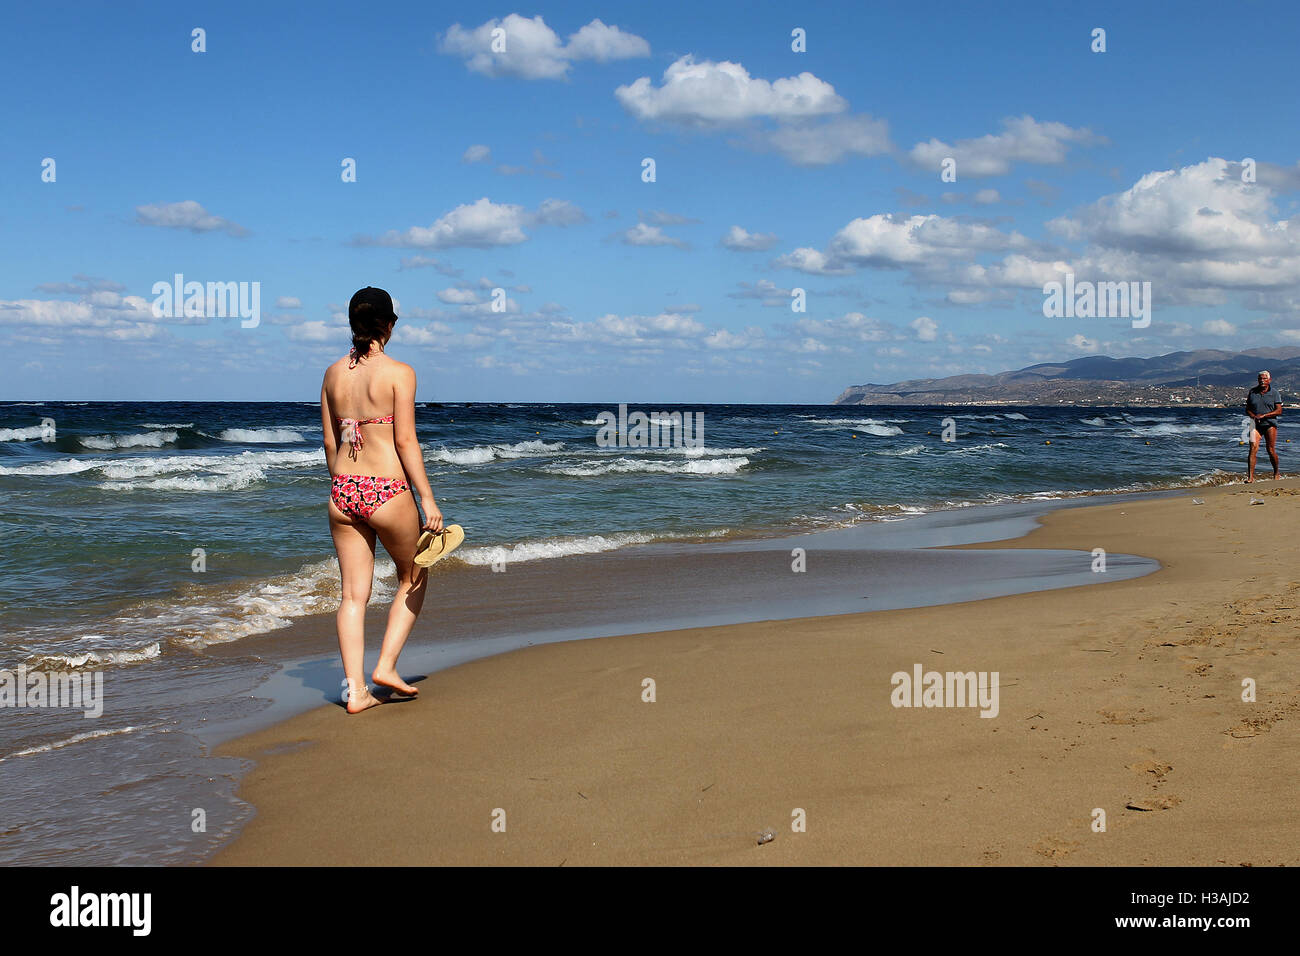 beach scenes from stalis stalida crete greece stock photo: 122550542